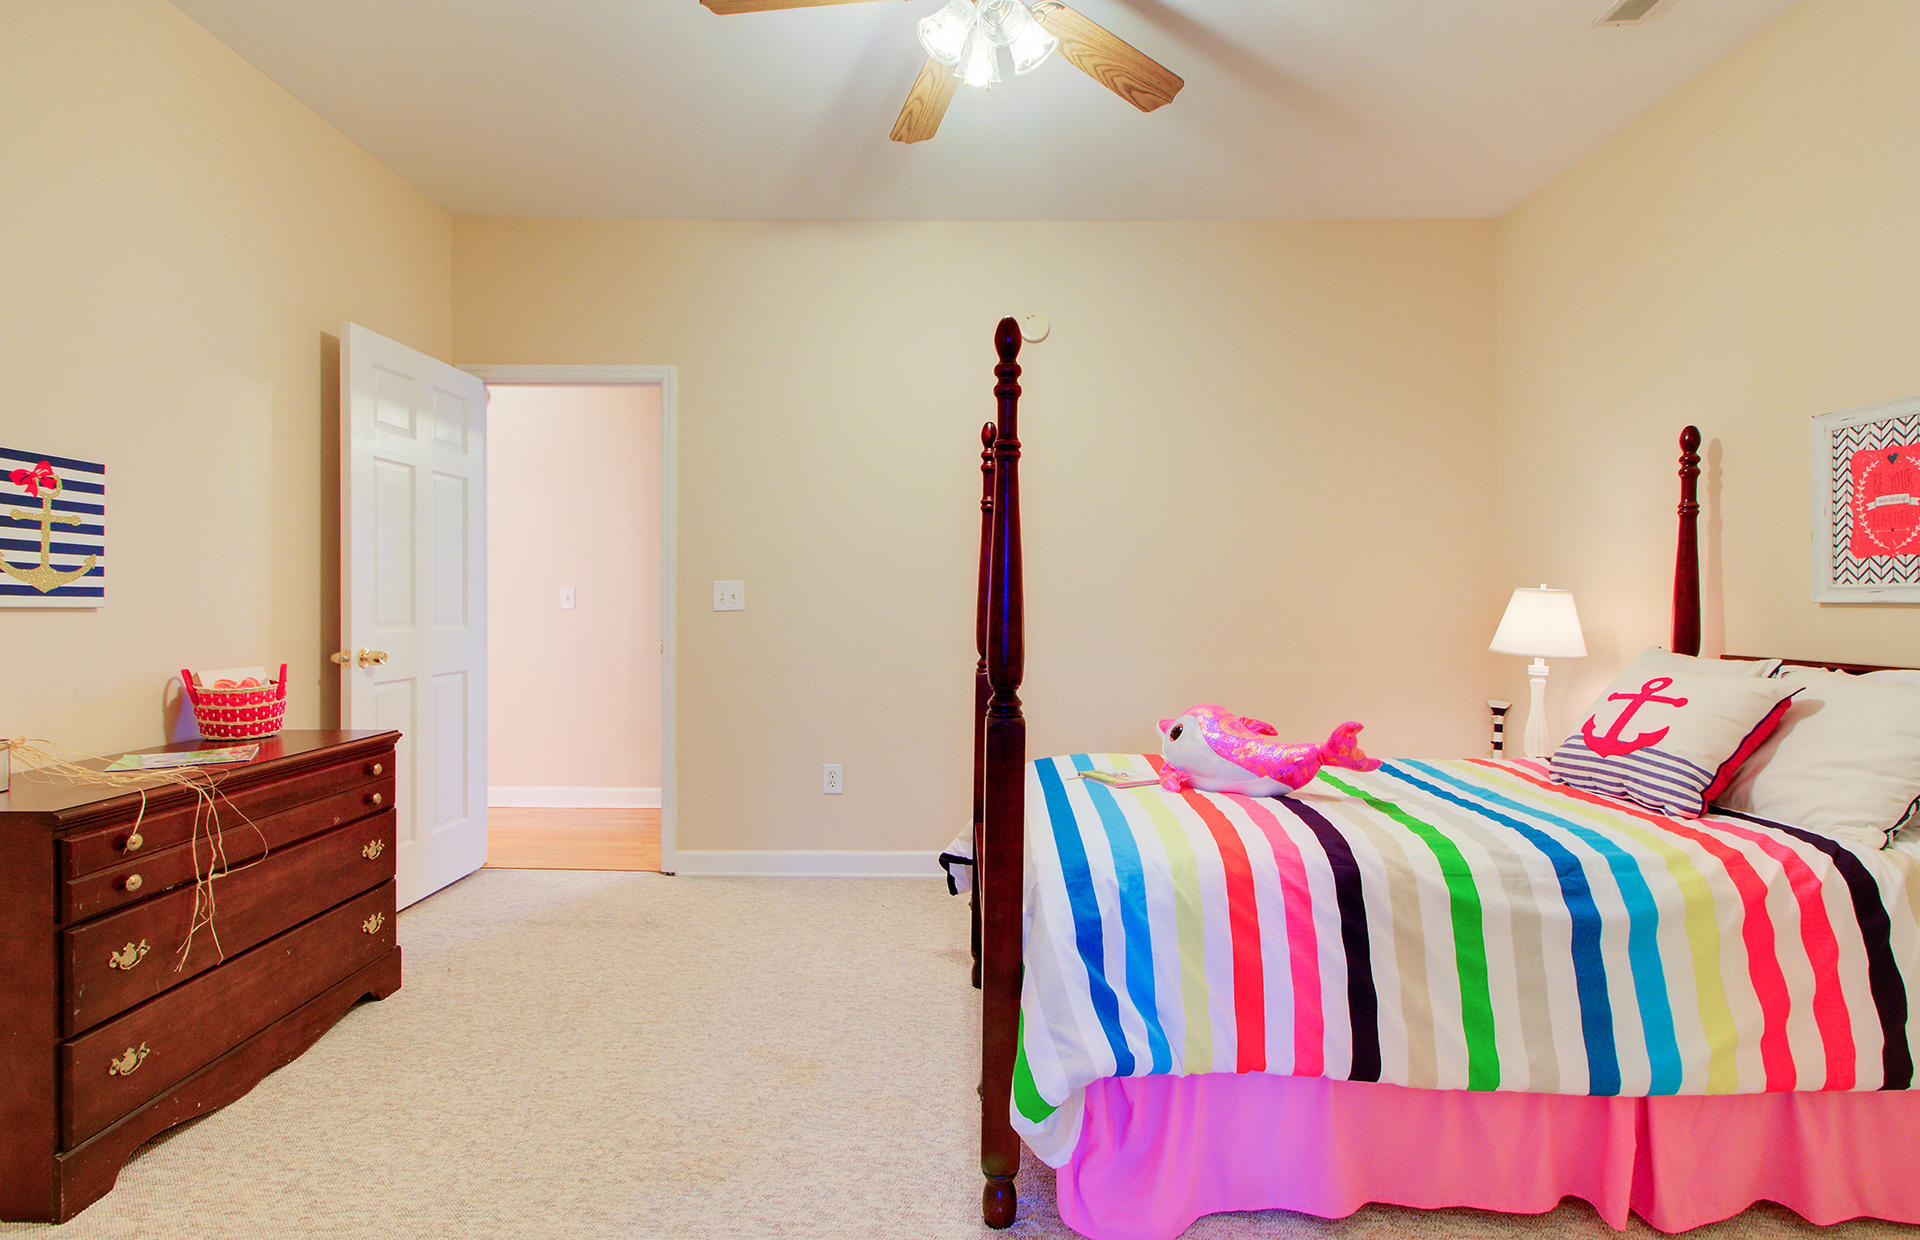 Bakers Landing Homes For Sale - 105 River Oak, North Charleston, SC - 3